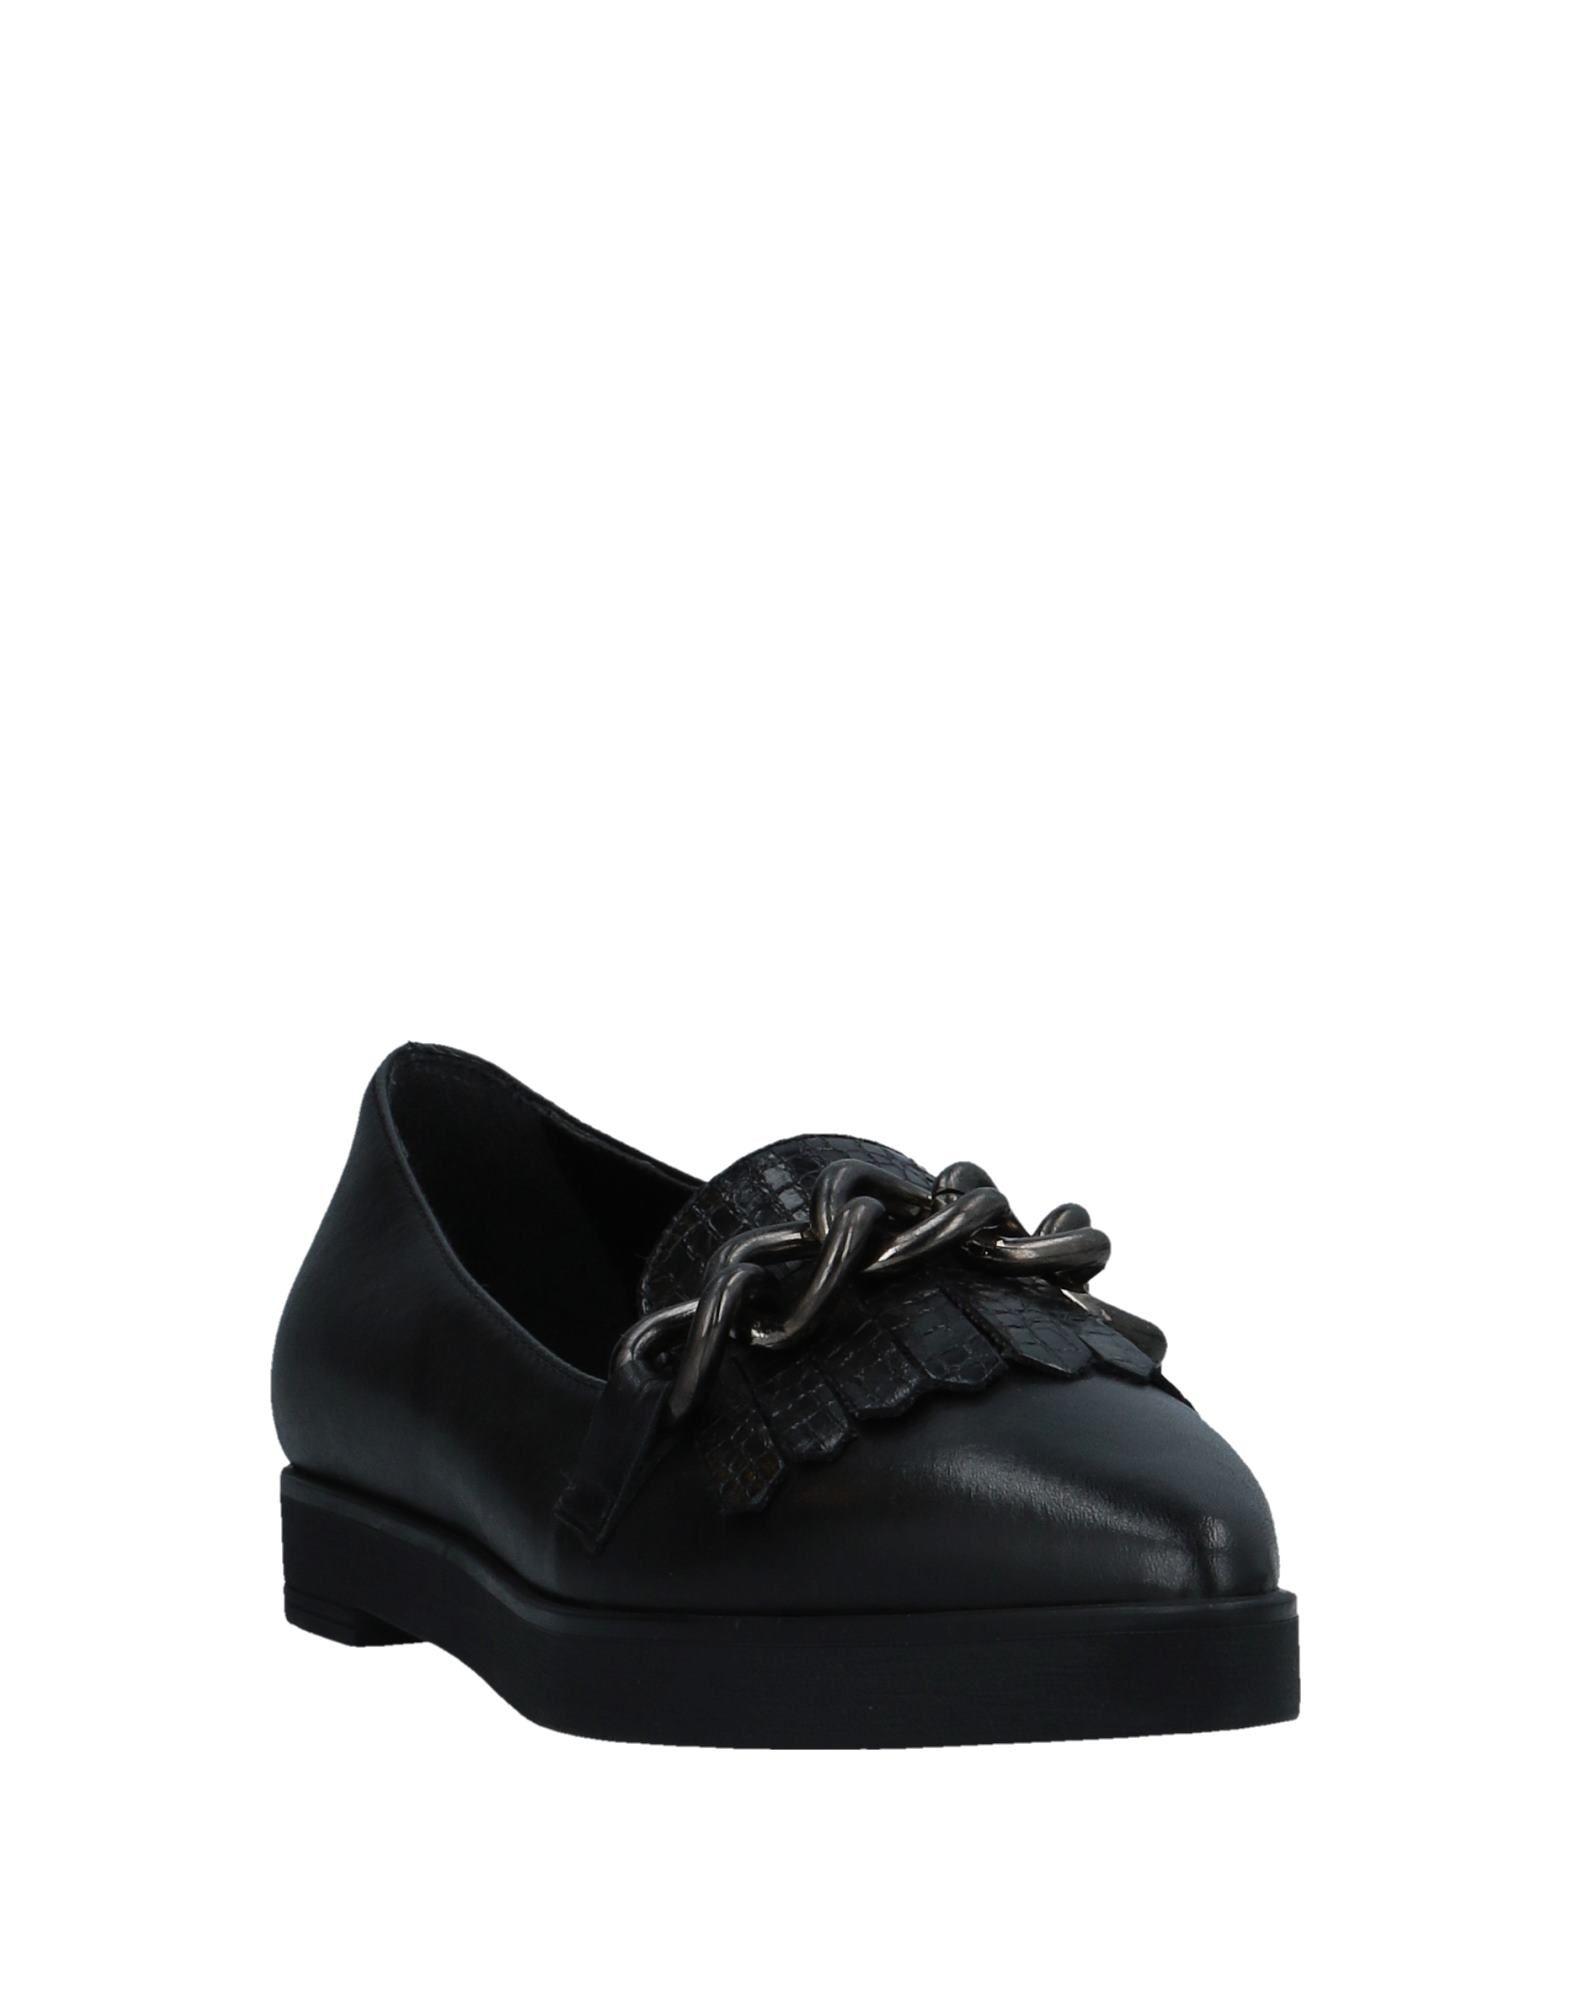 Chocolà Chocolà Chocolà Mokassins Damen  11529607XO Gute Qualität beliebte Schuhe 4ecc22